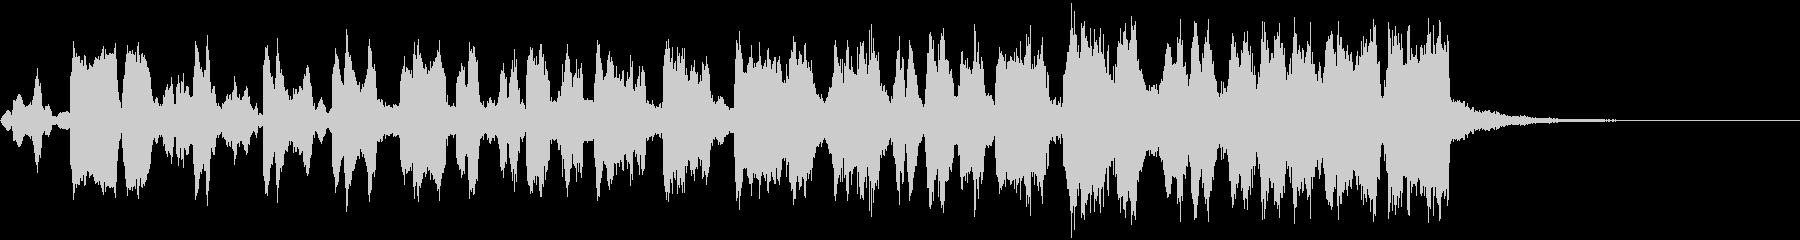 CINEMATIC RISER_16の未再生の波形